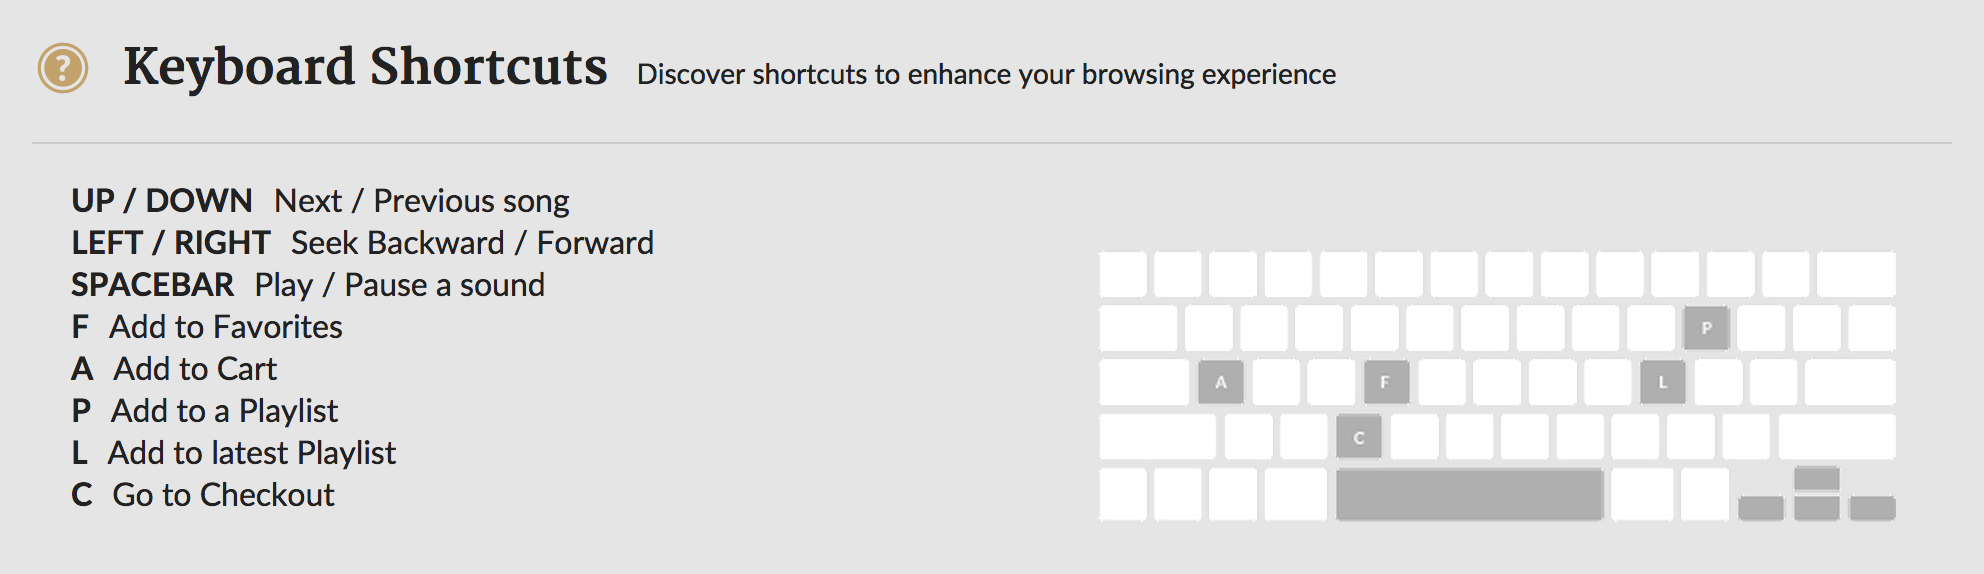 PremiumBeat: Shortcuts